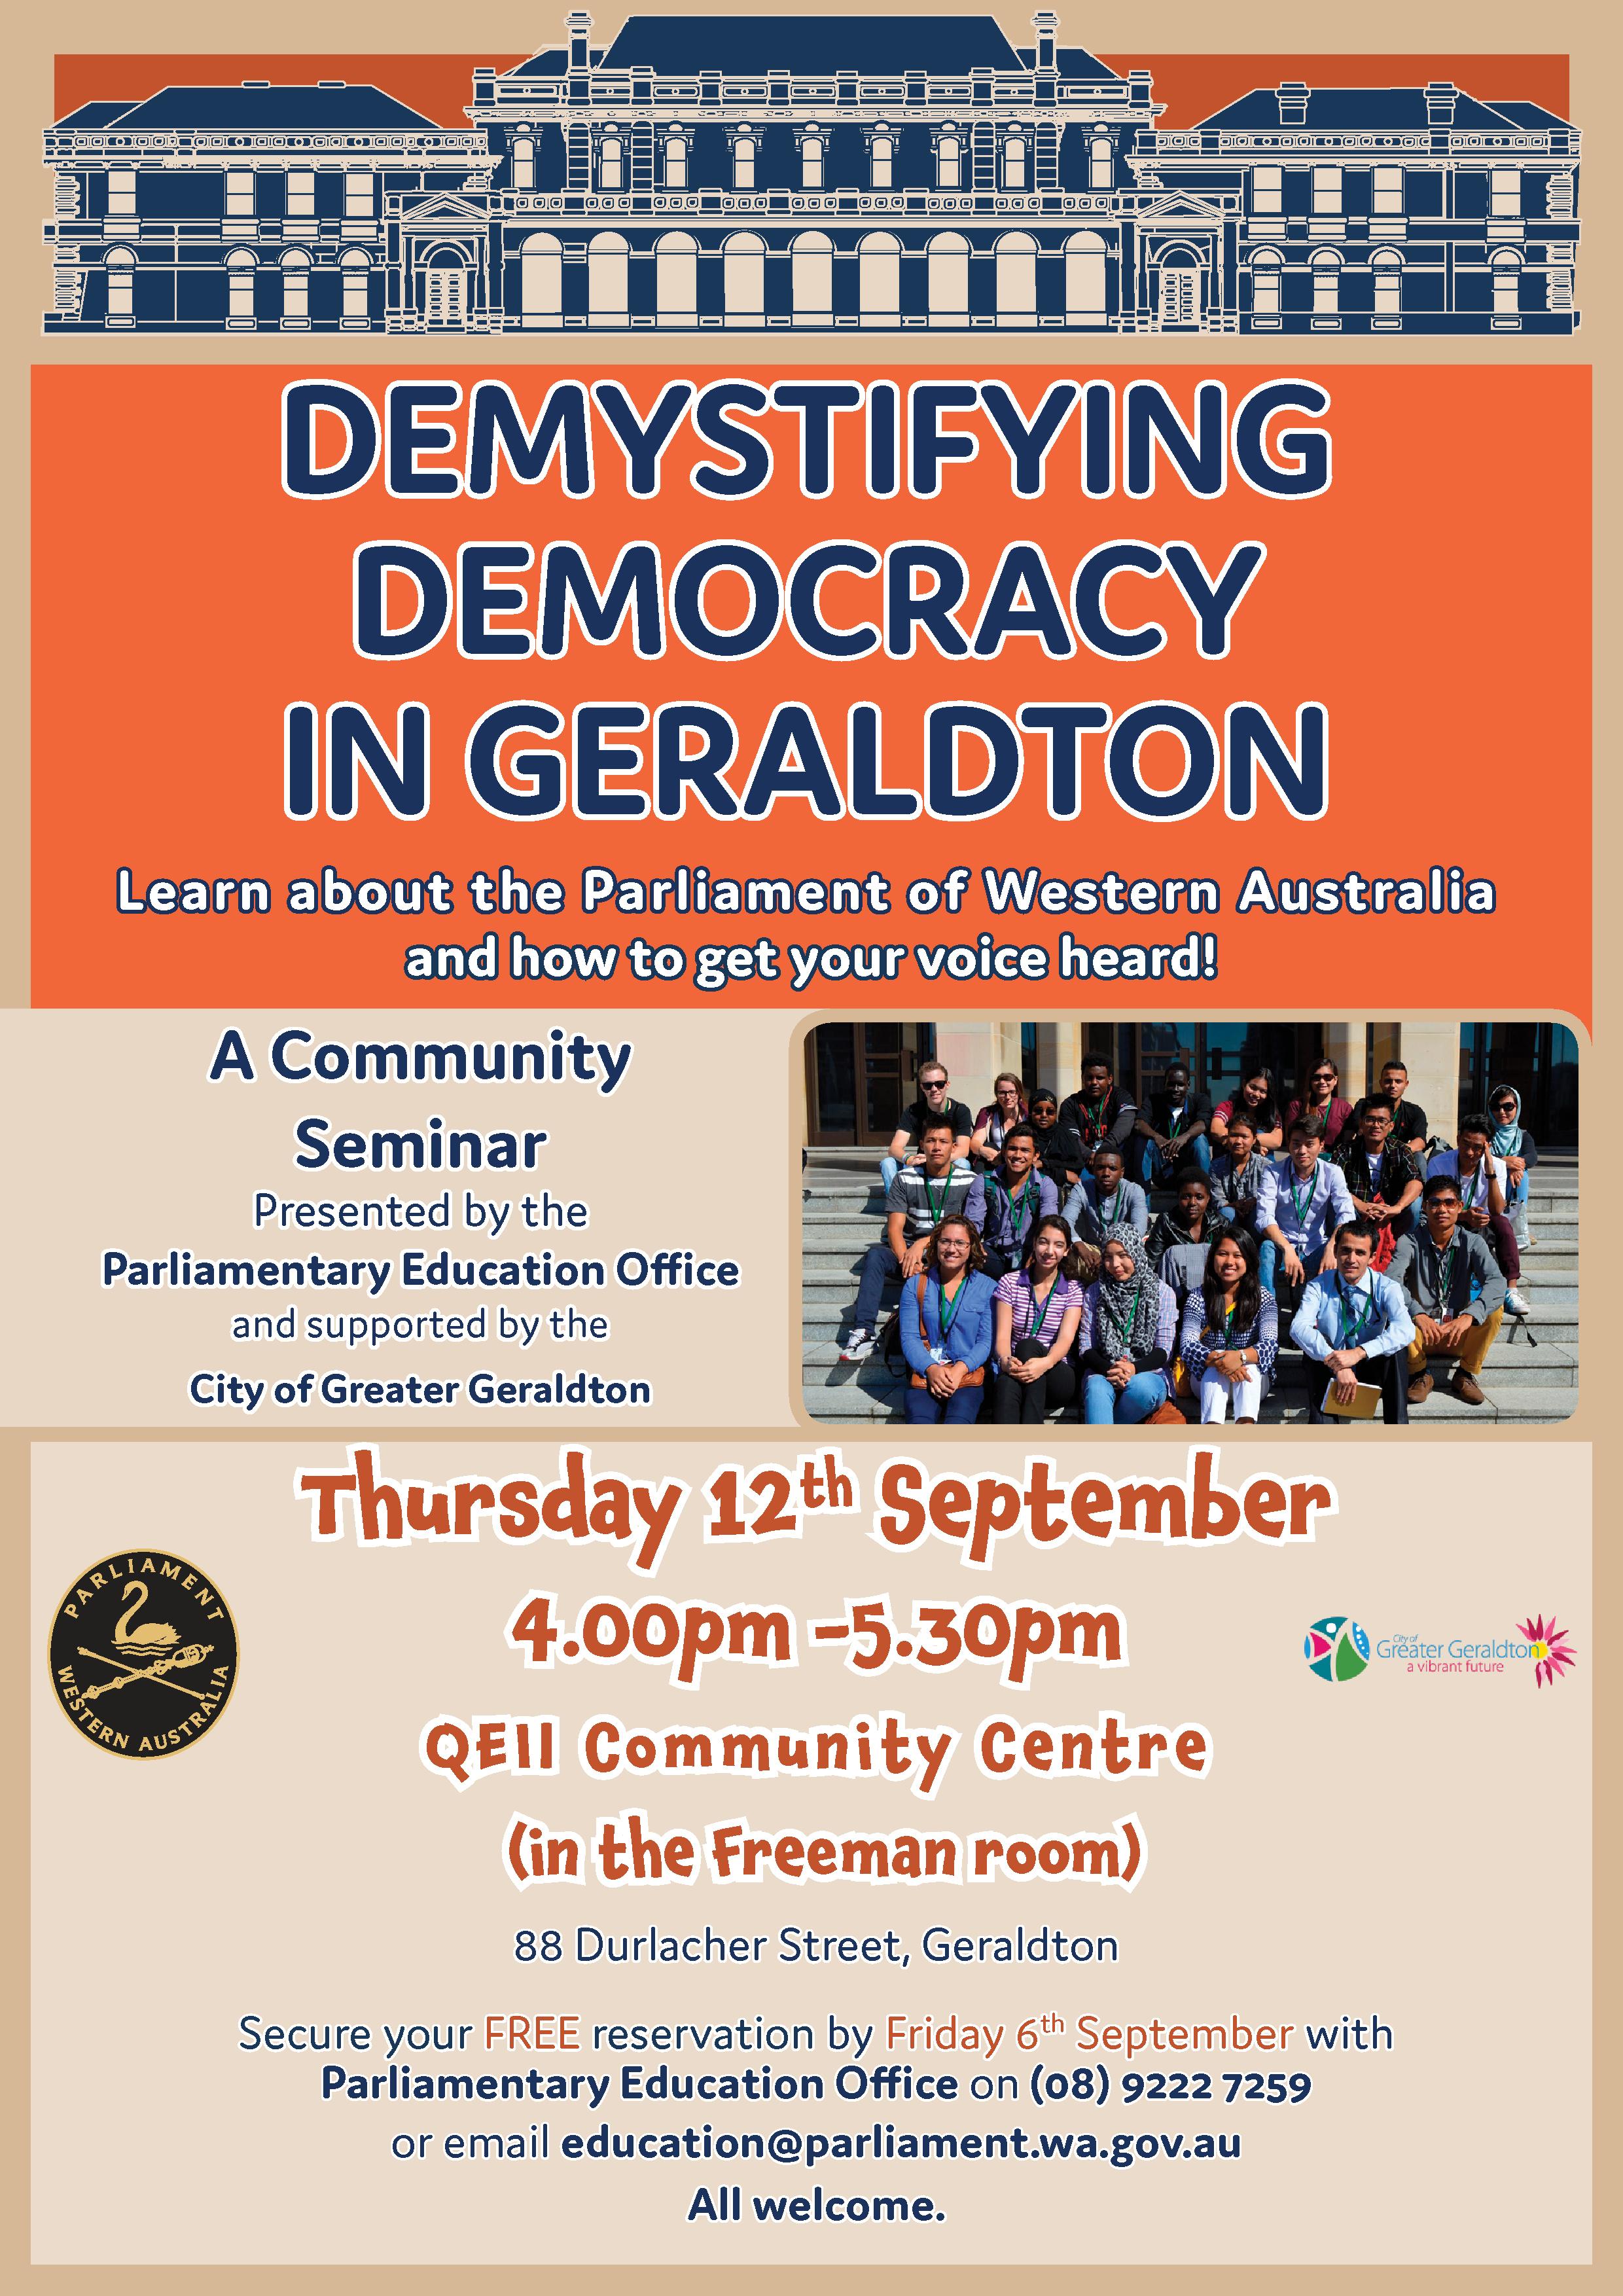 Demystifying Democracy - Geraldton Community Poster (003).jpg